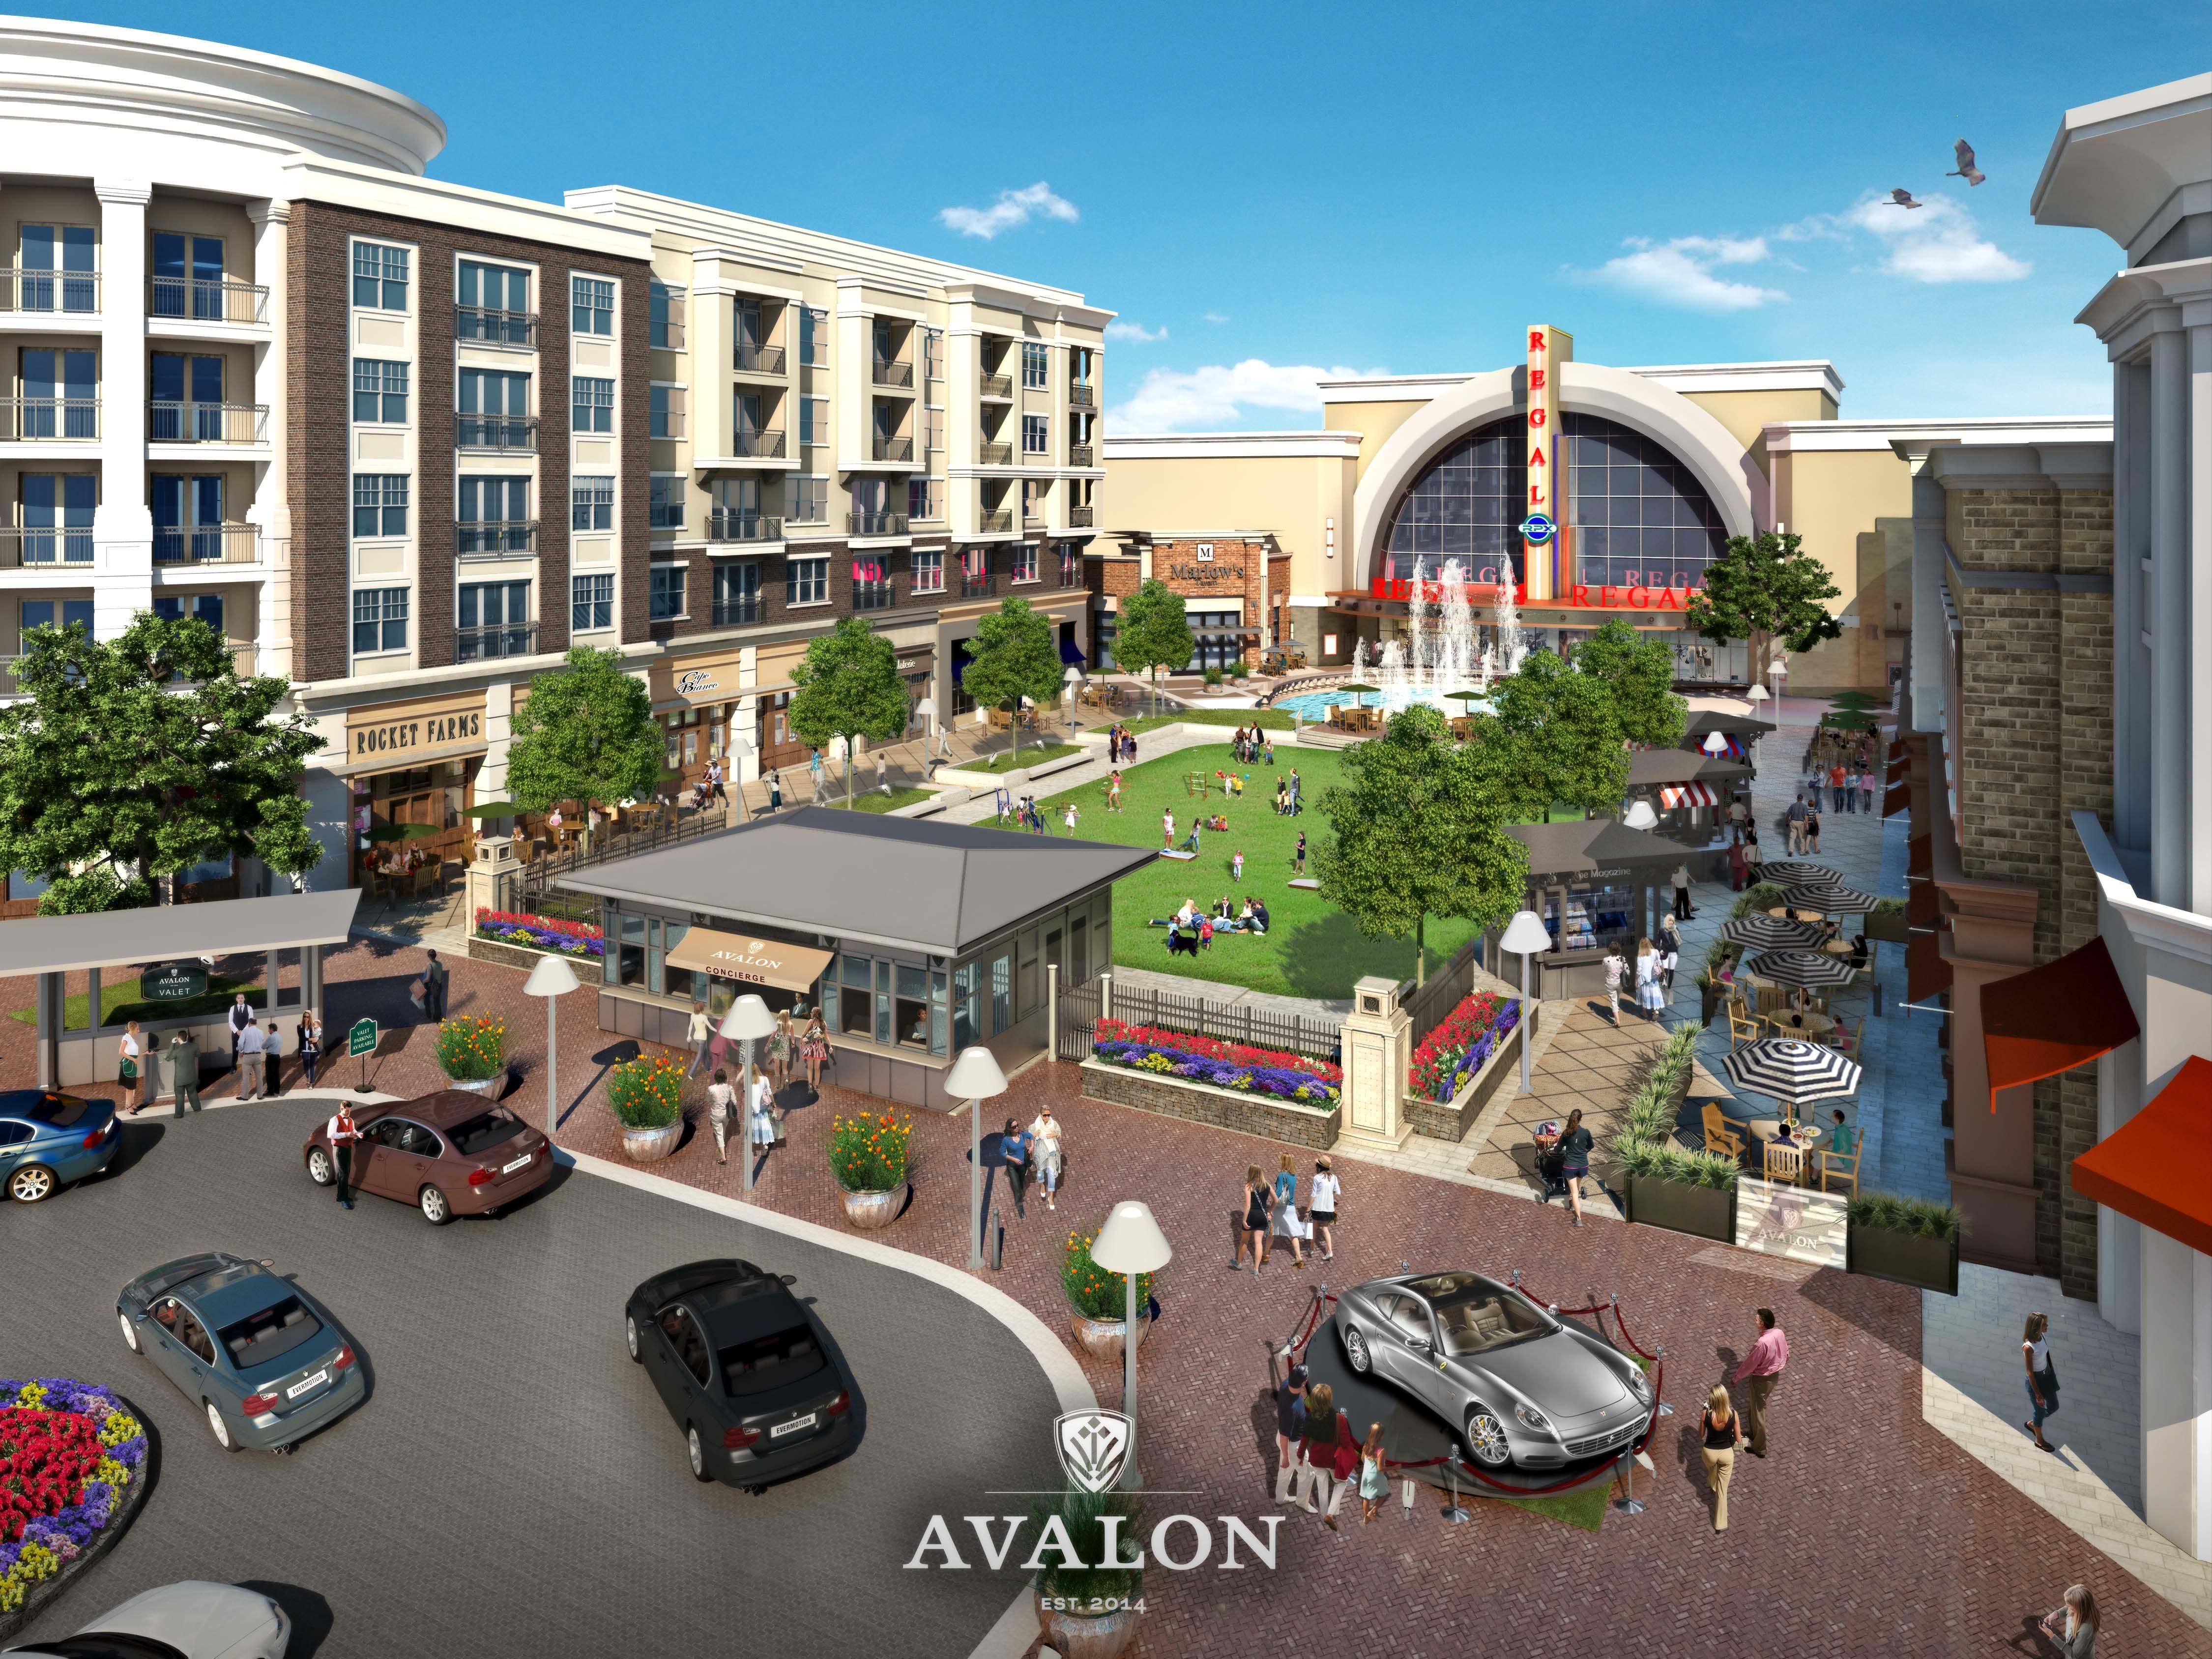 Avalon Alpharetta Ga >> Proposed Avalon Design Facebook Com Alpharettasnobs Alpharetta